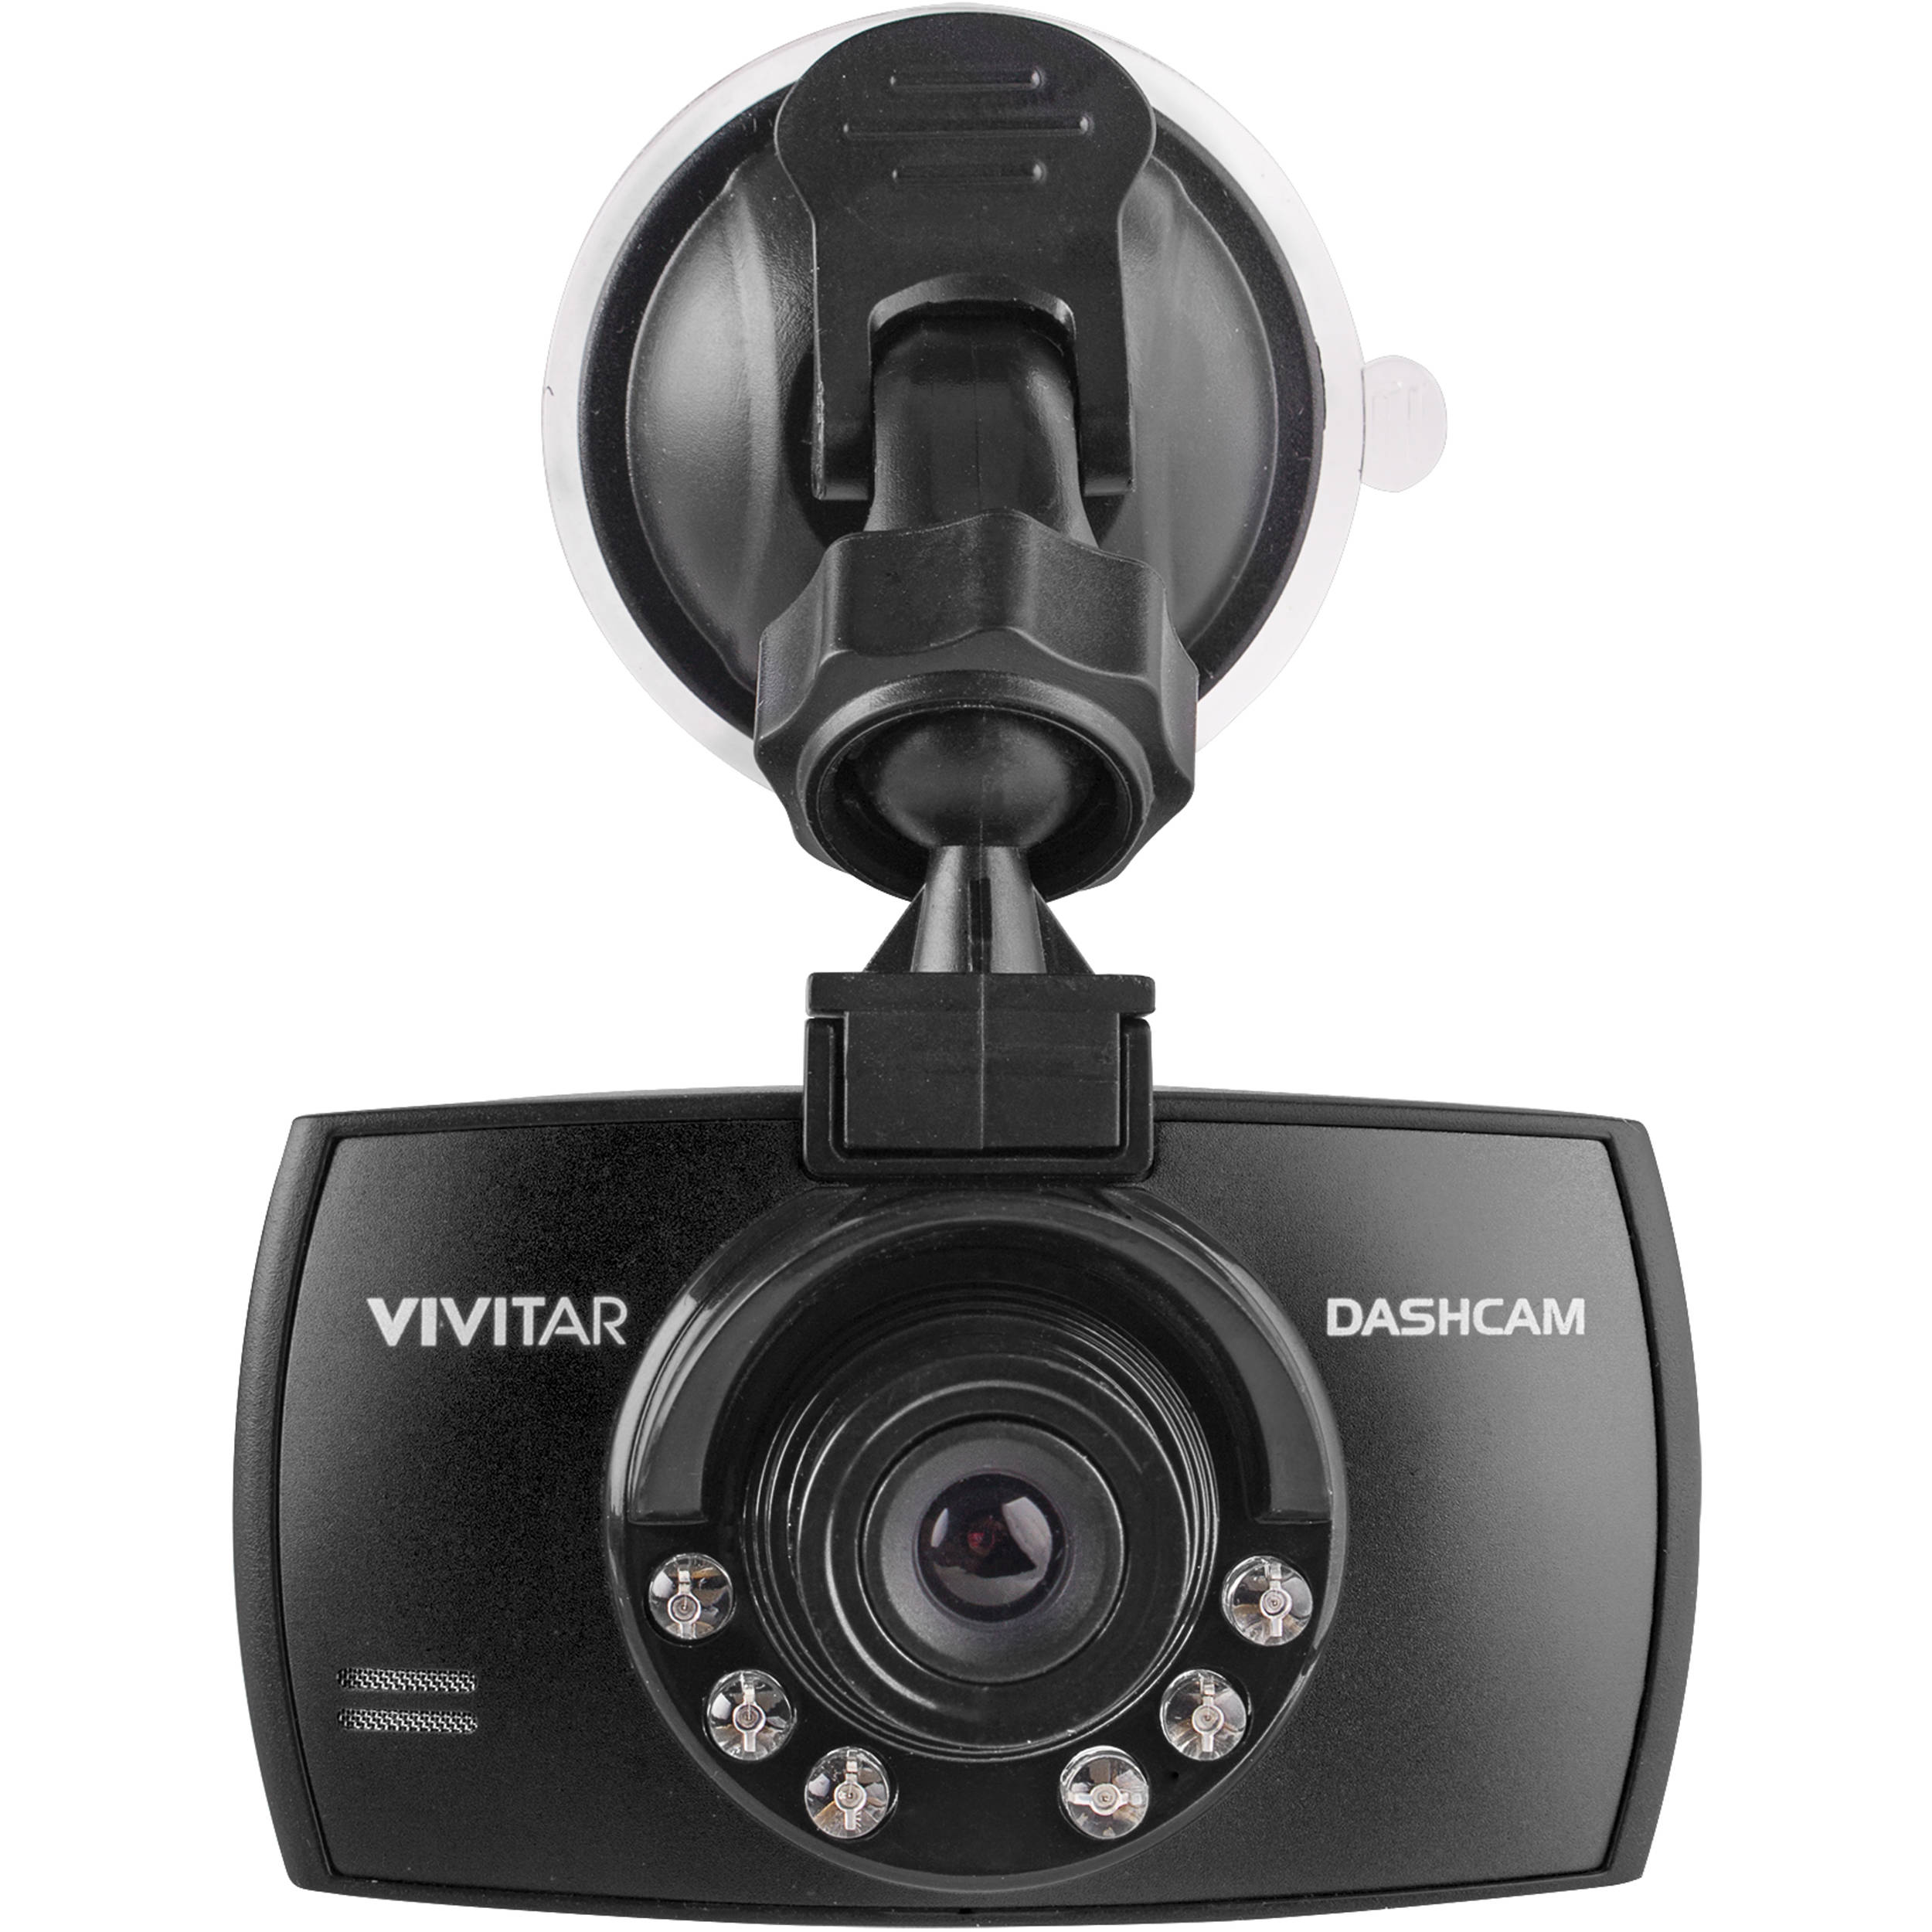 Vivitar DCM106 Dash Cam with 2.4